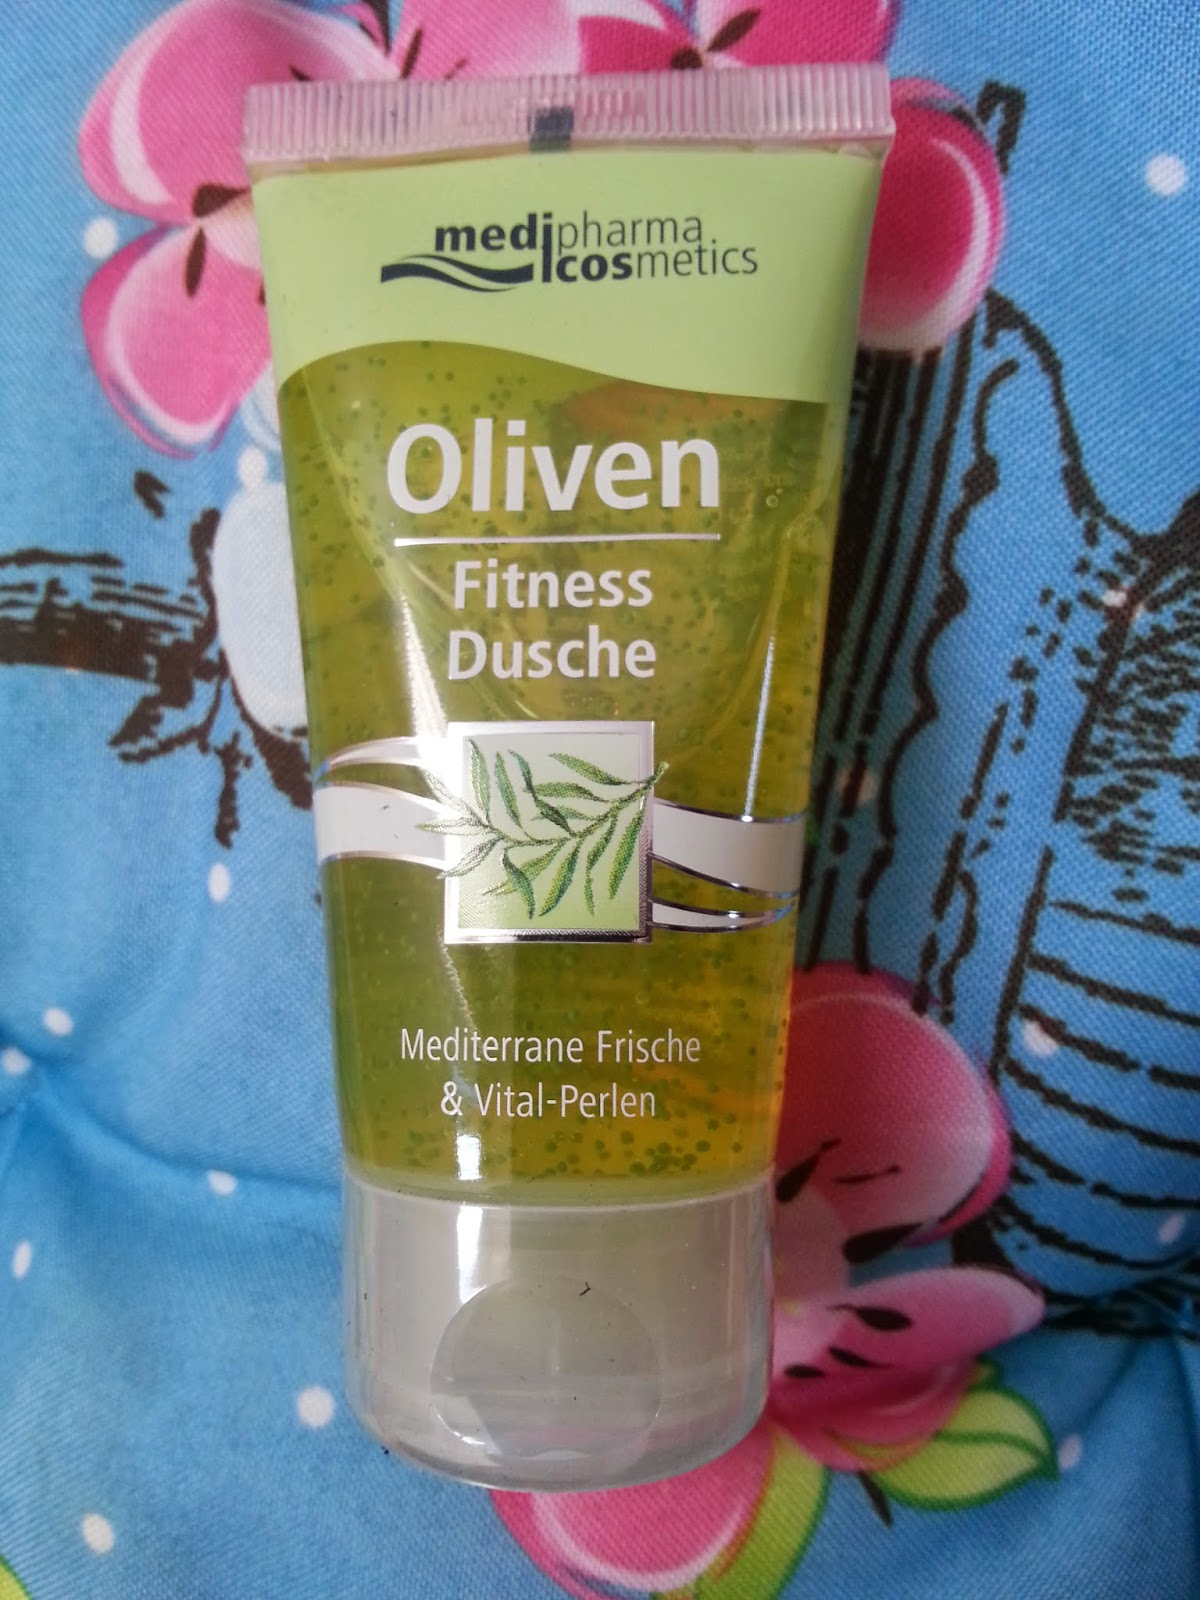 Medipharma Cosmeitcs - Oliven Fitness Dusche - www.annitschkasblog.de